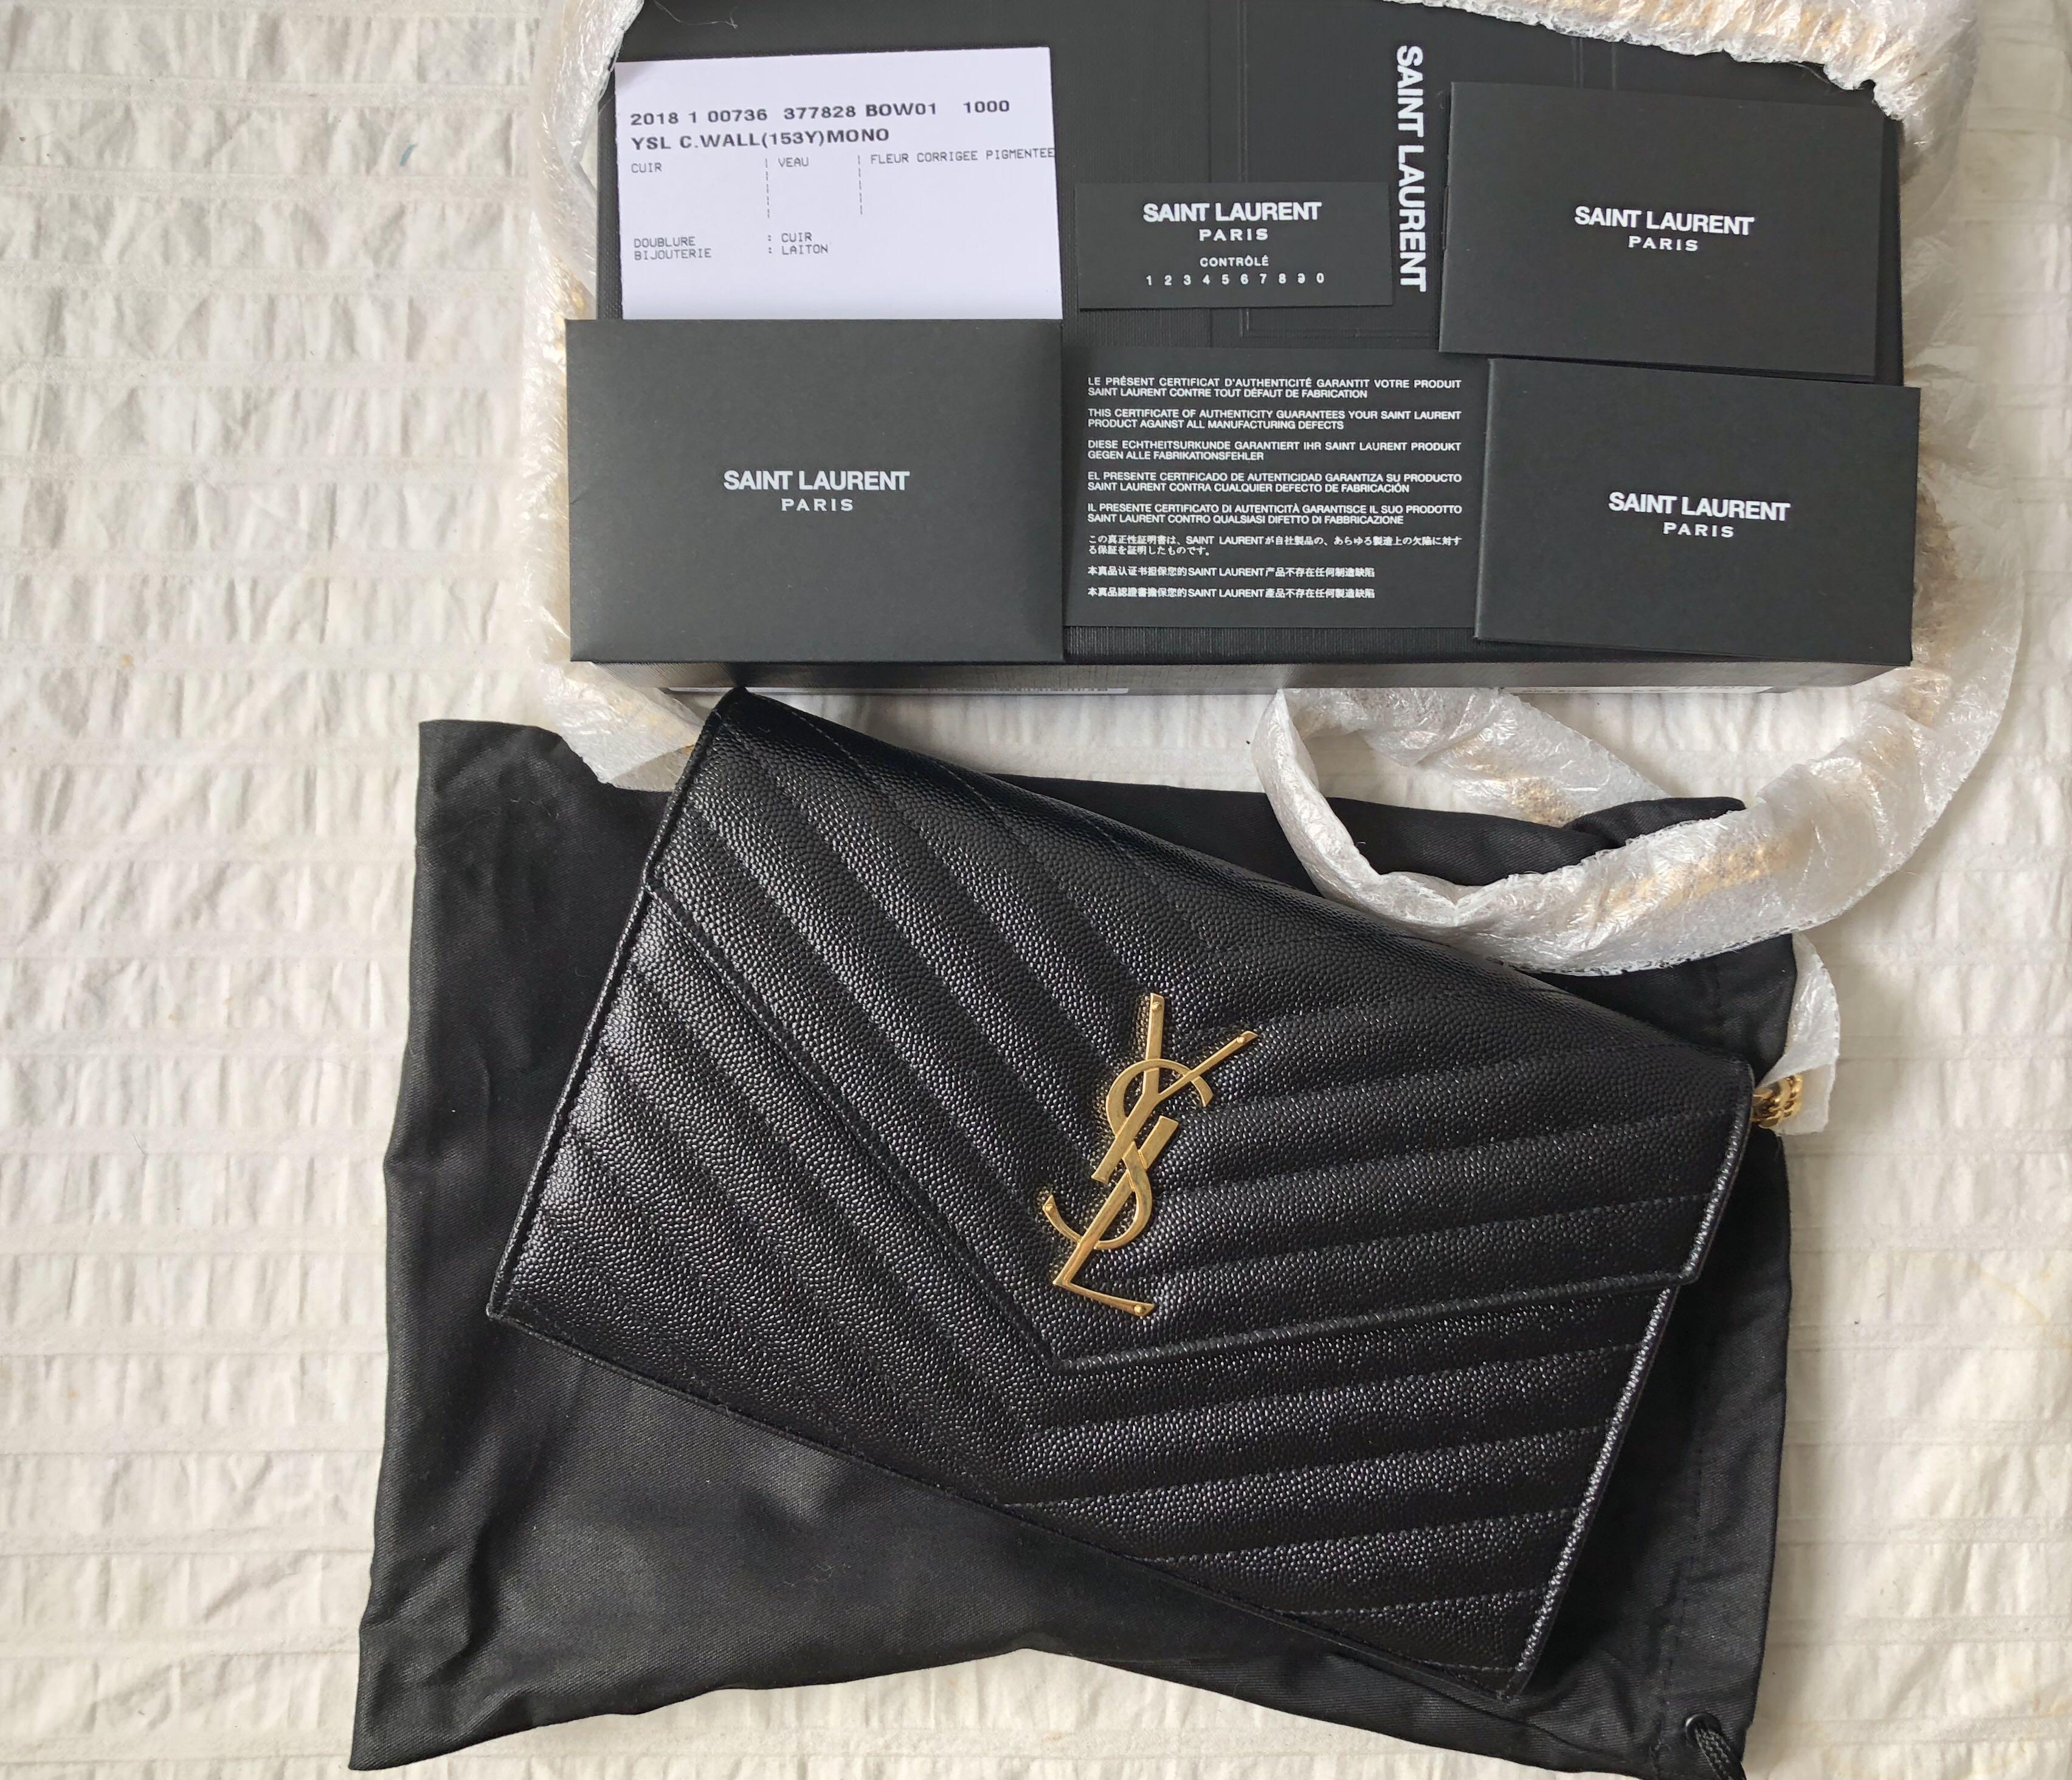 aa23cc4199 New w Receipt] Authentic Large Saint Laurent YSL Wallet On Chain WOC ...